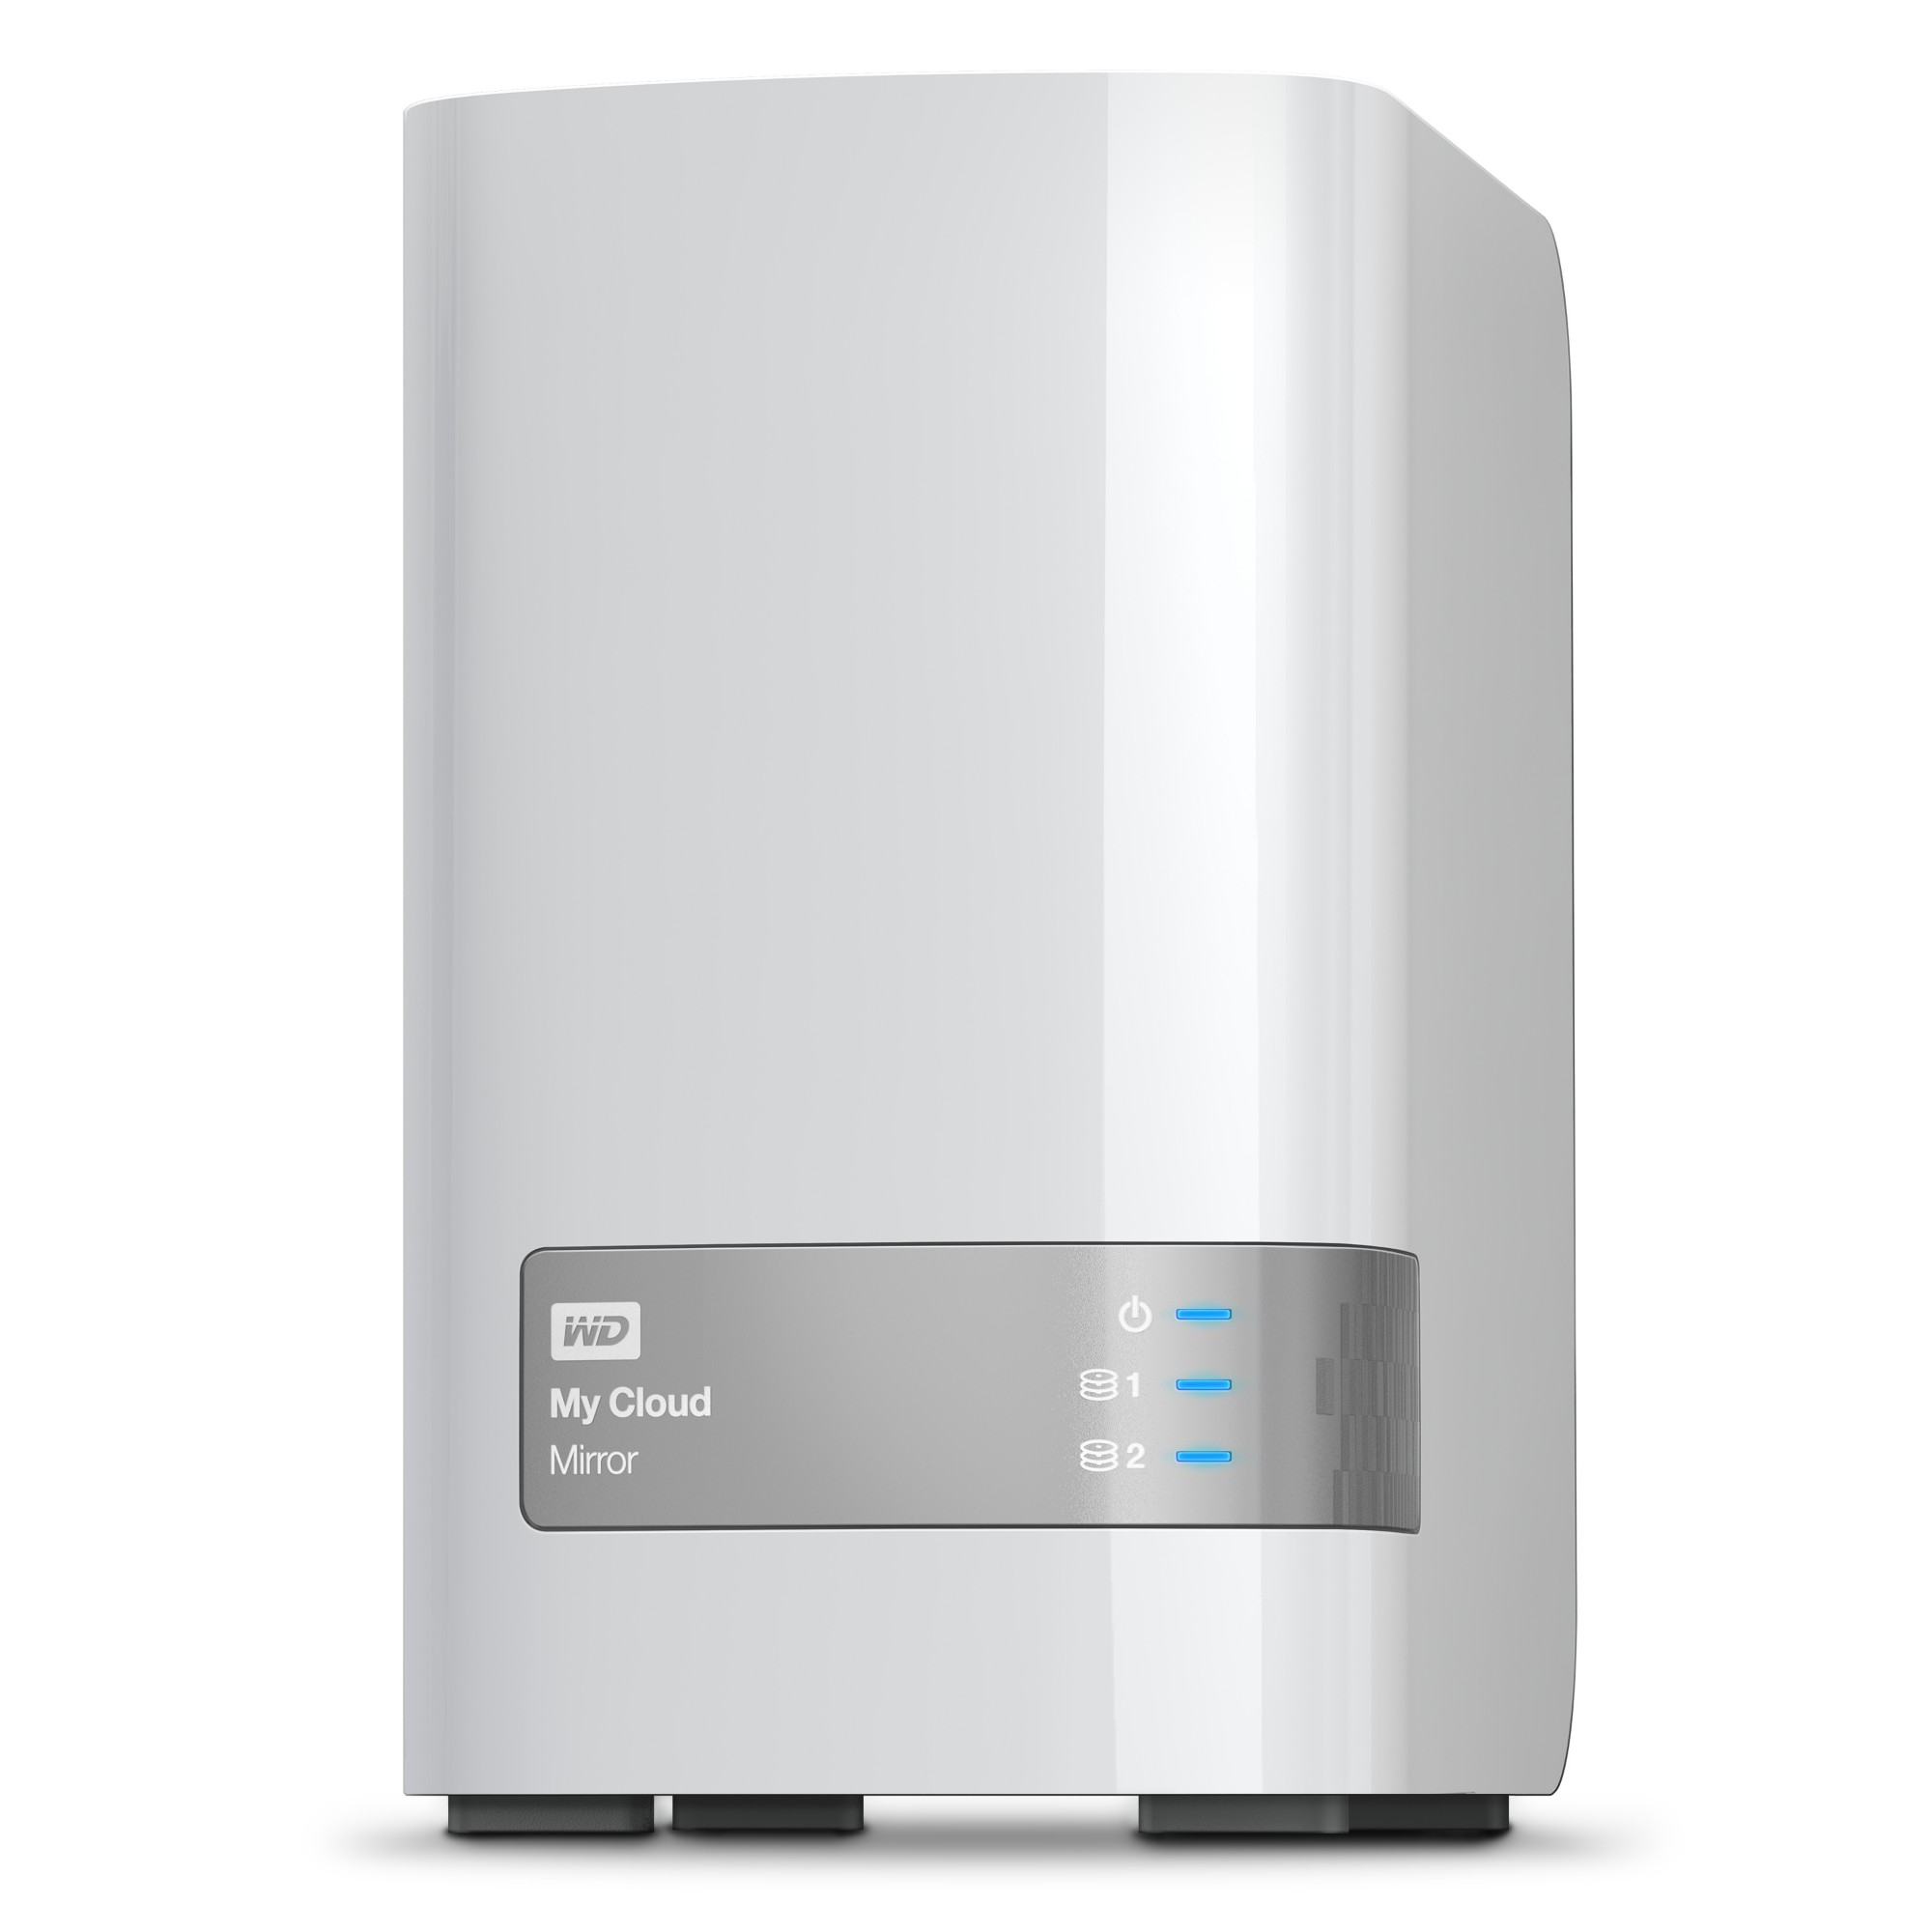 Western Digital My Cloud Mirror 8TB Ethernet LAN White personal cloud storage device